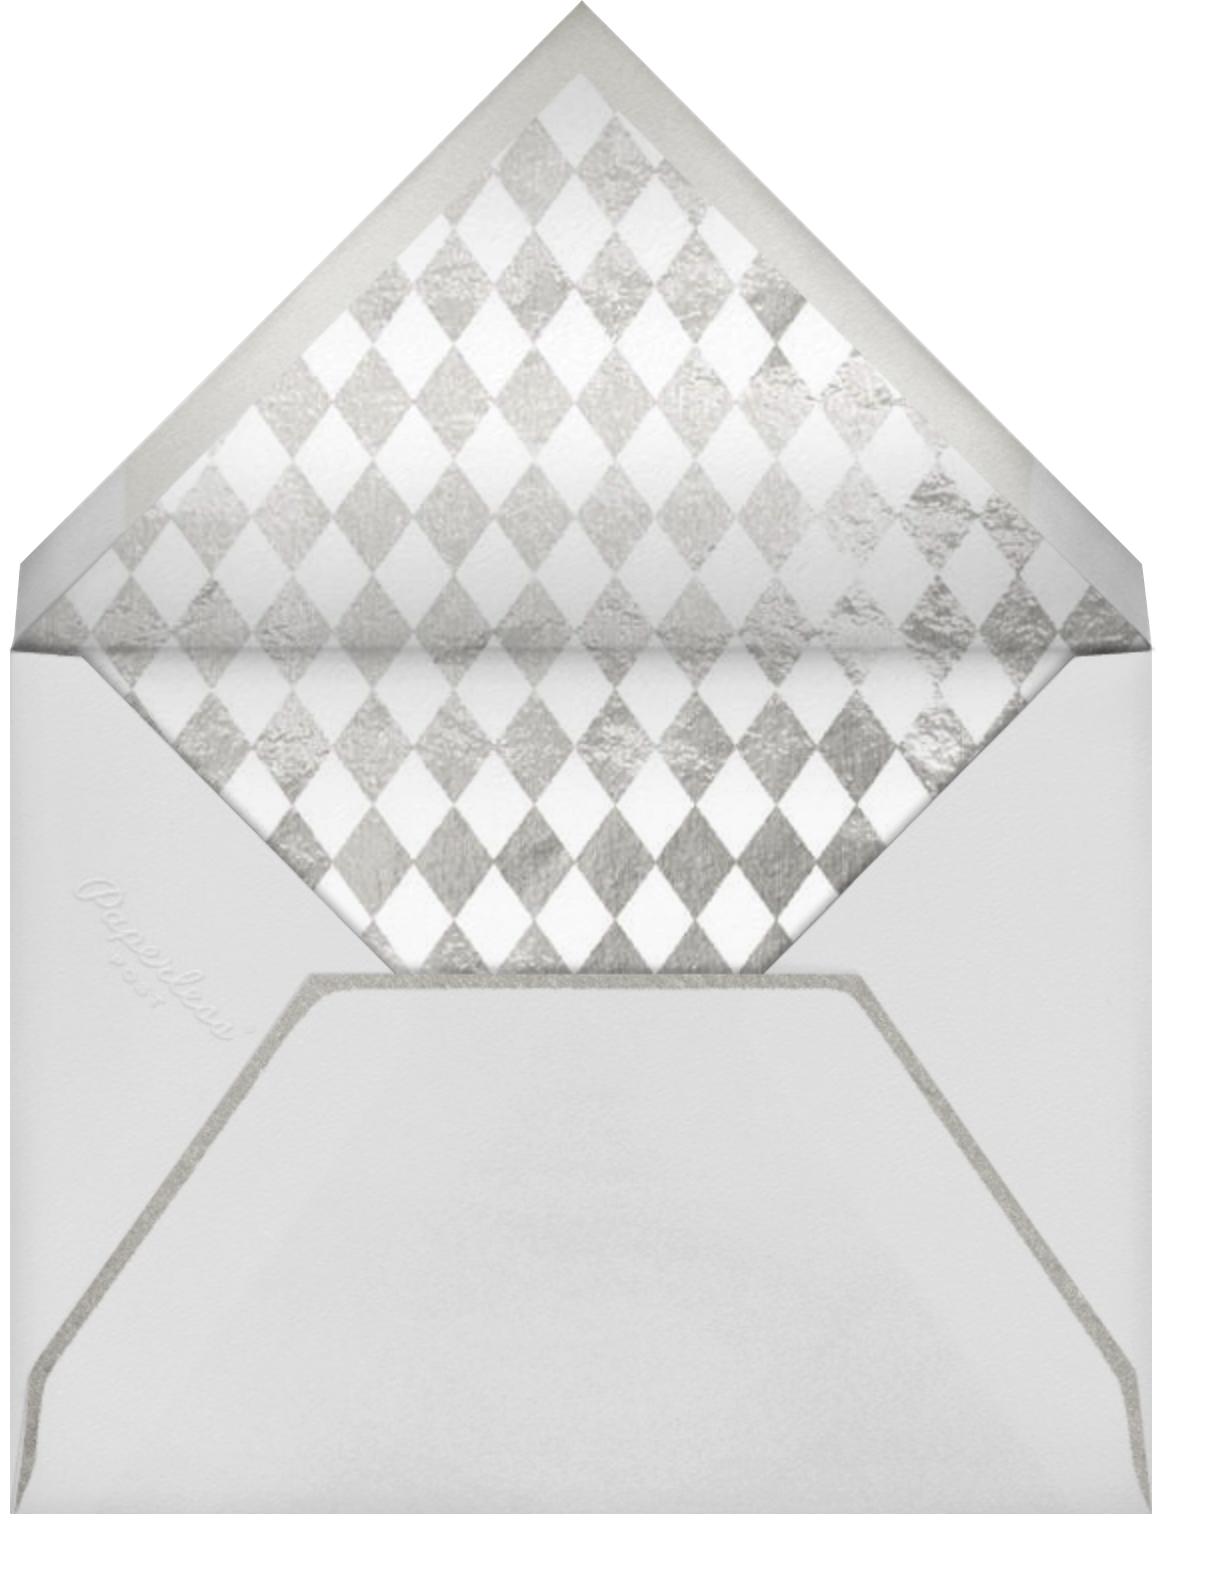 Snapshot Silver - Square - Paperless Post - Envelope